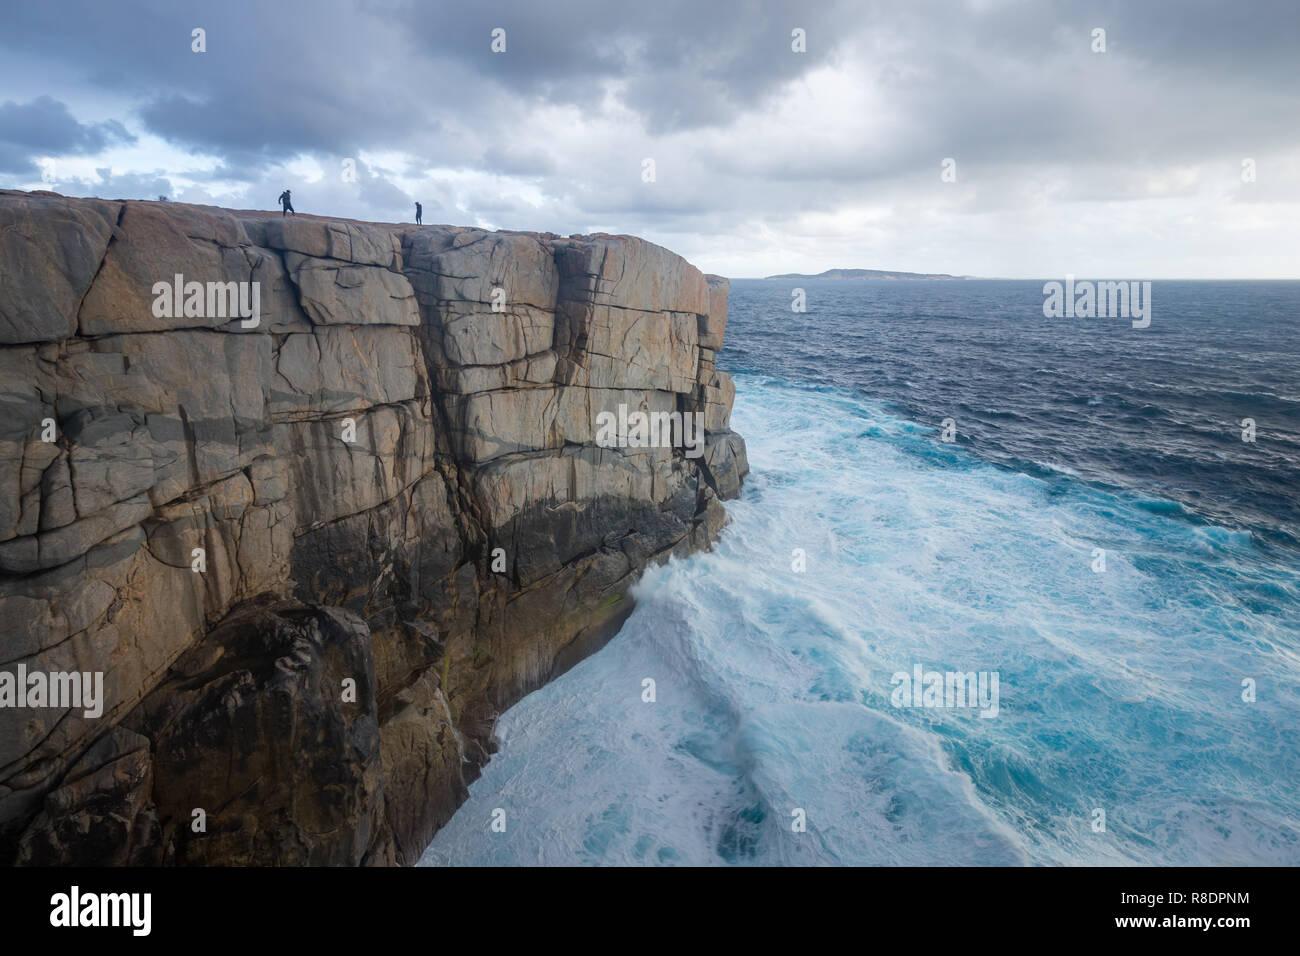 The Gap, Albany,Western Australia - Stock Image